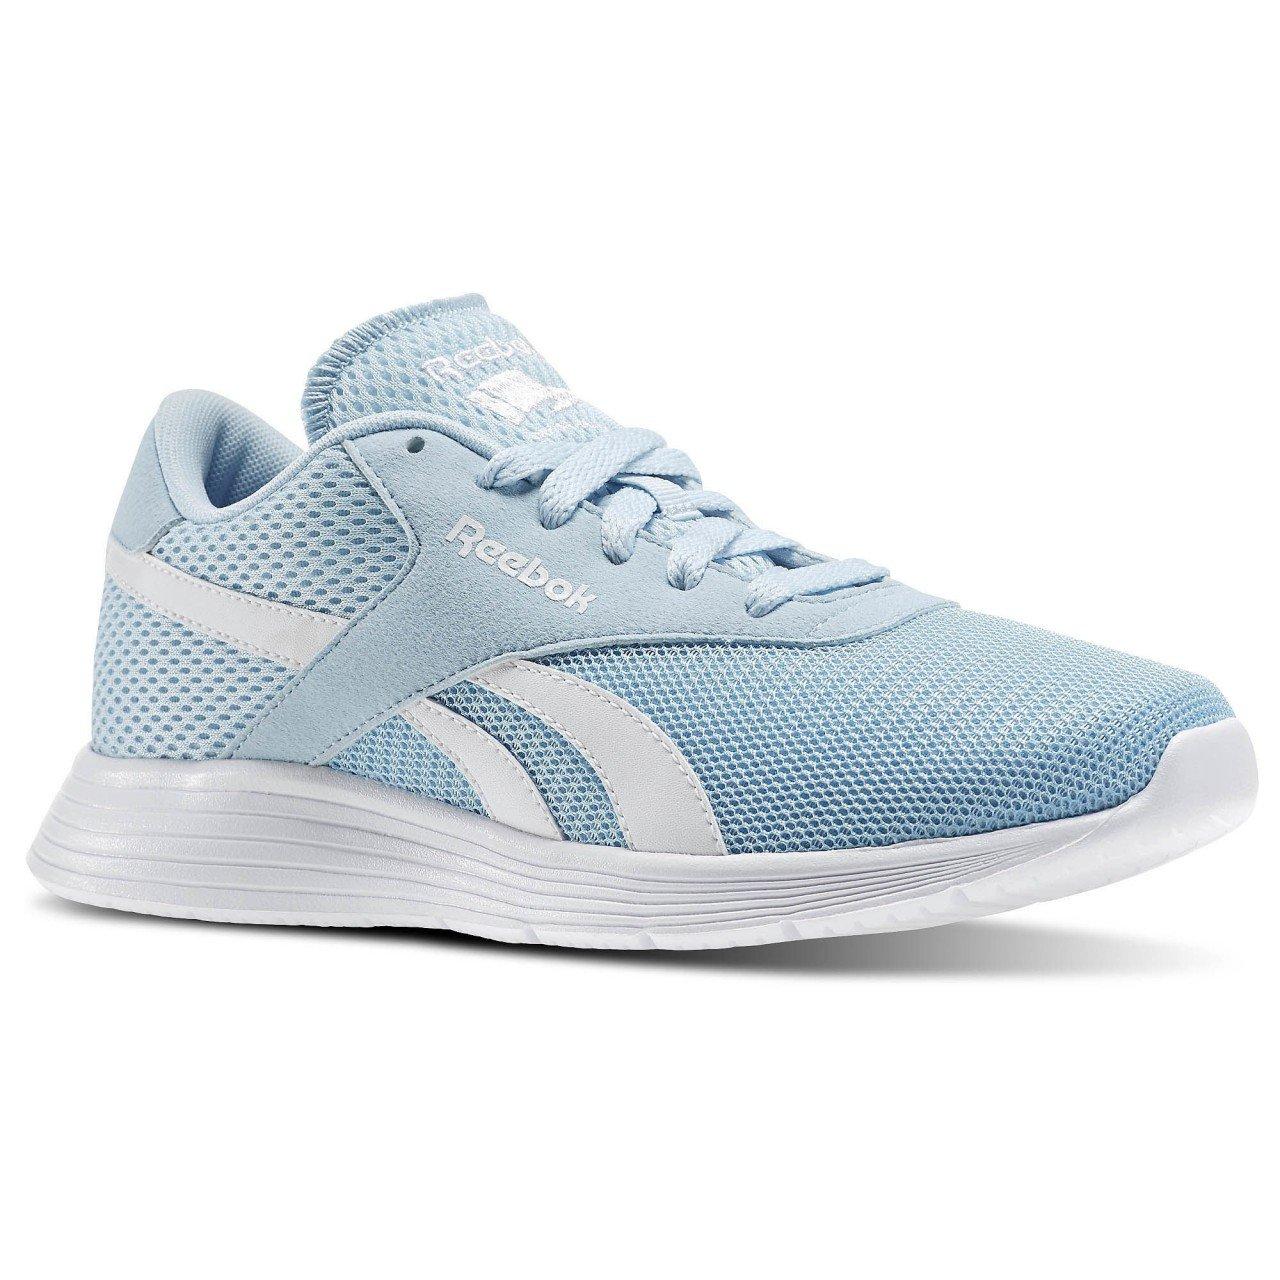 Reebok Royal EC Ride, Chaussures de Sport Femme, Azul/Blanco (Zee Blue/White), 41 EU